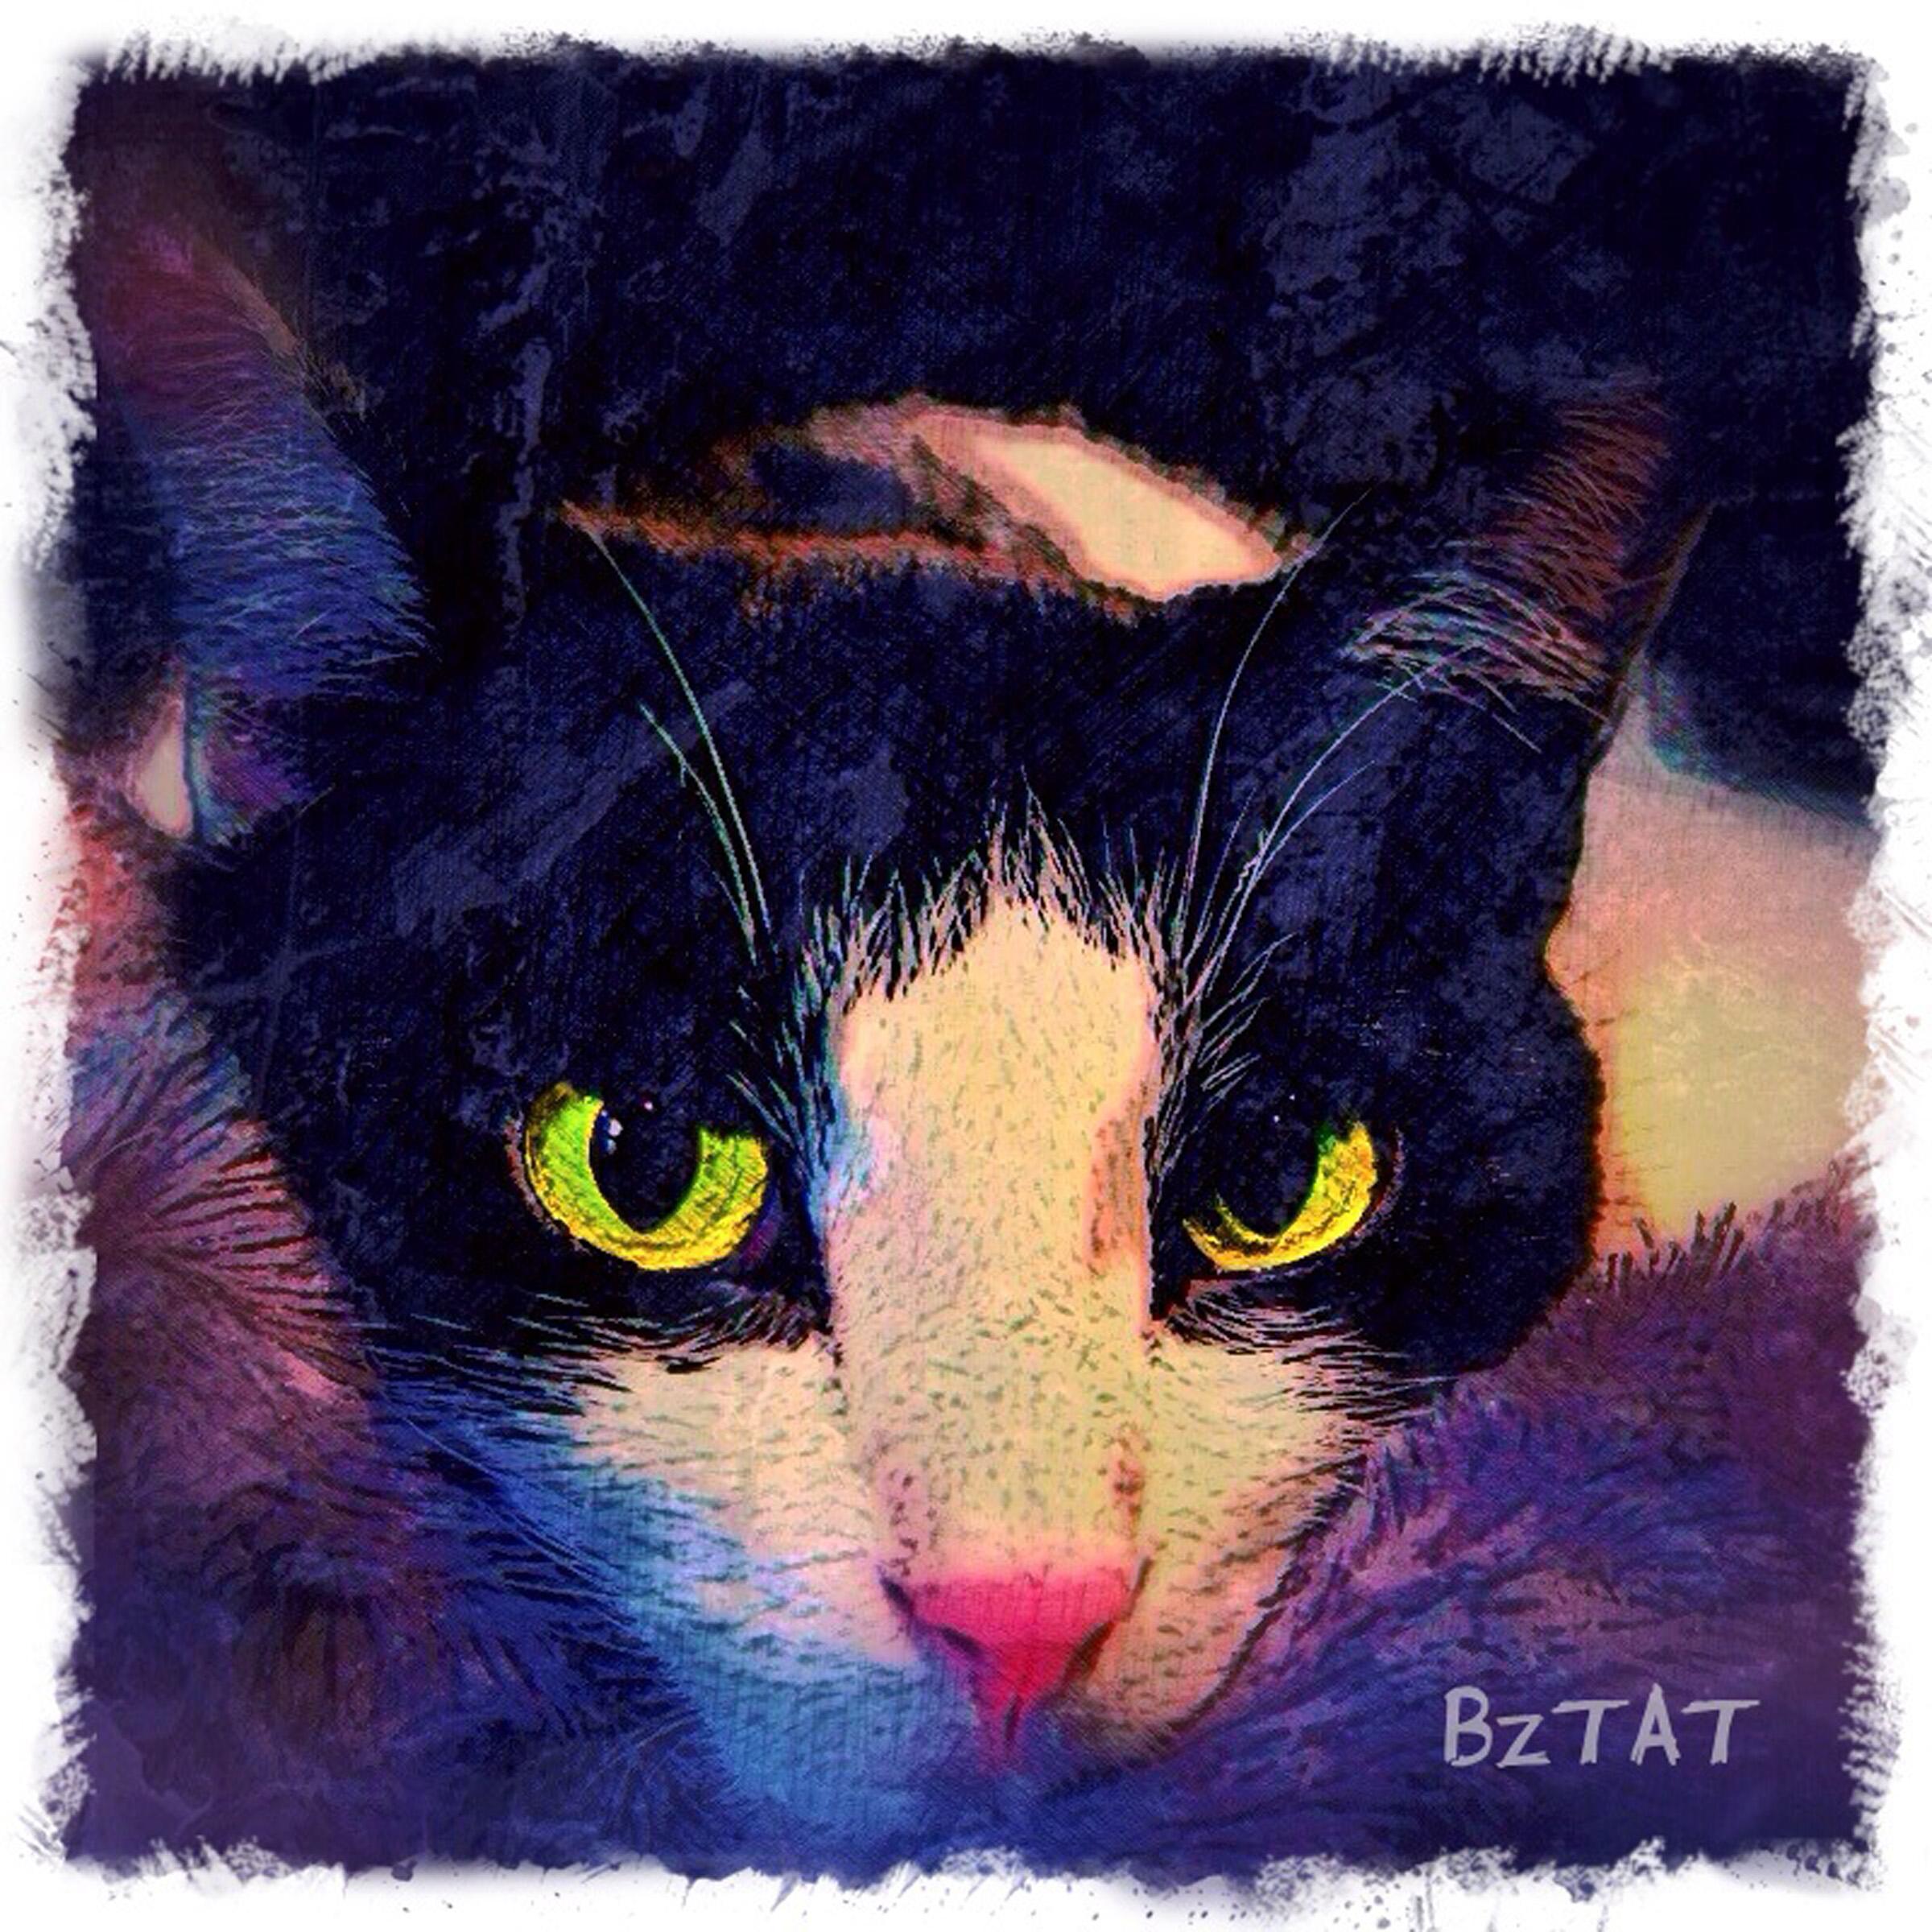 3-Digital-pet-portrait-cat-art-calendar-BZTAT